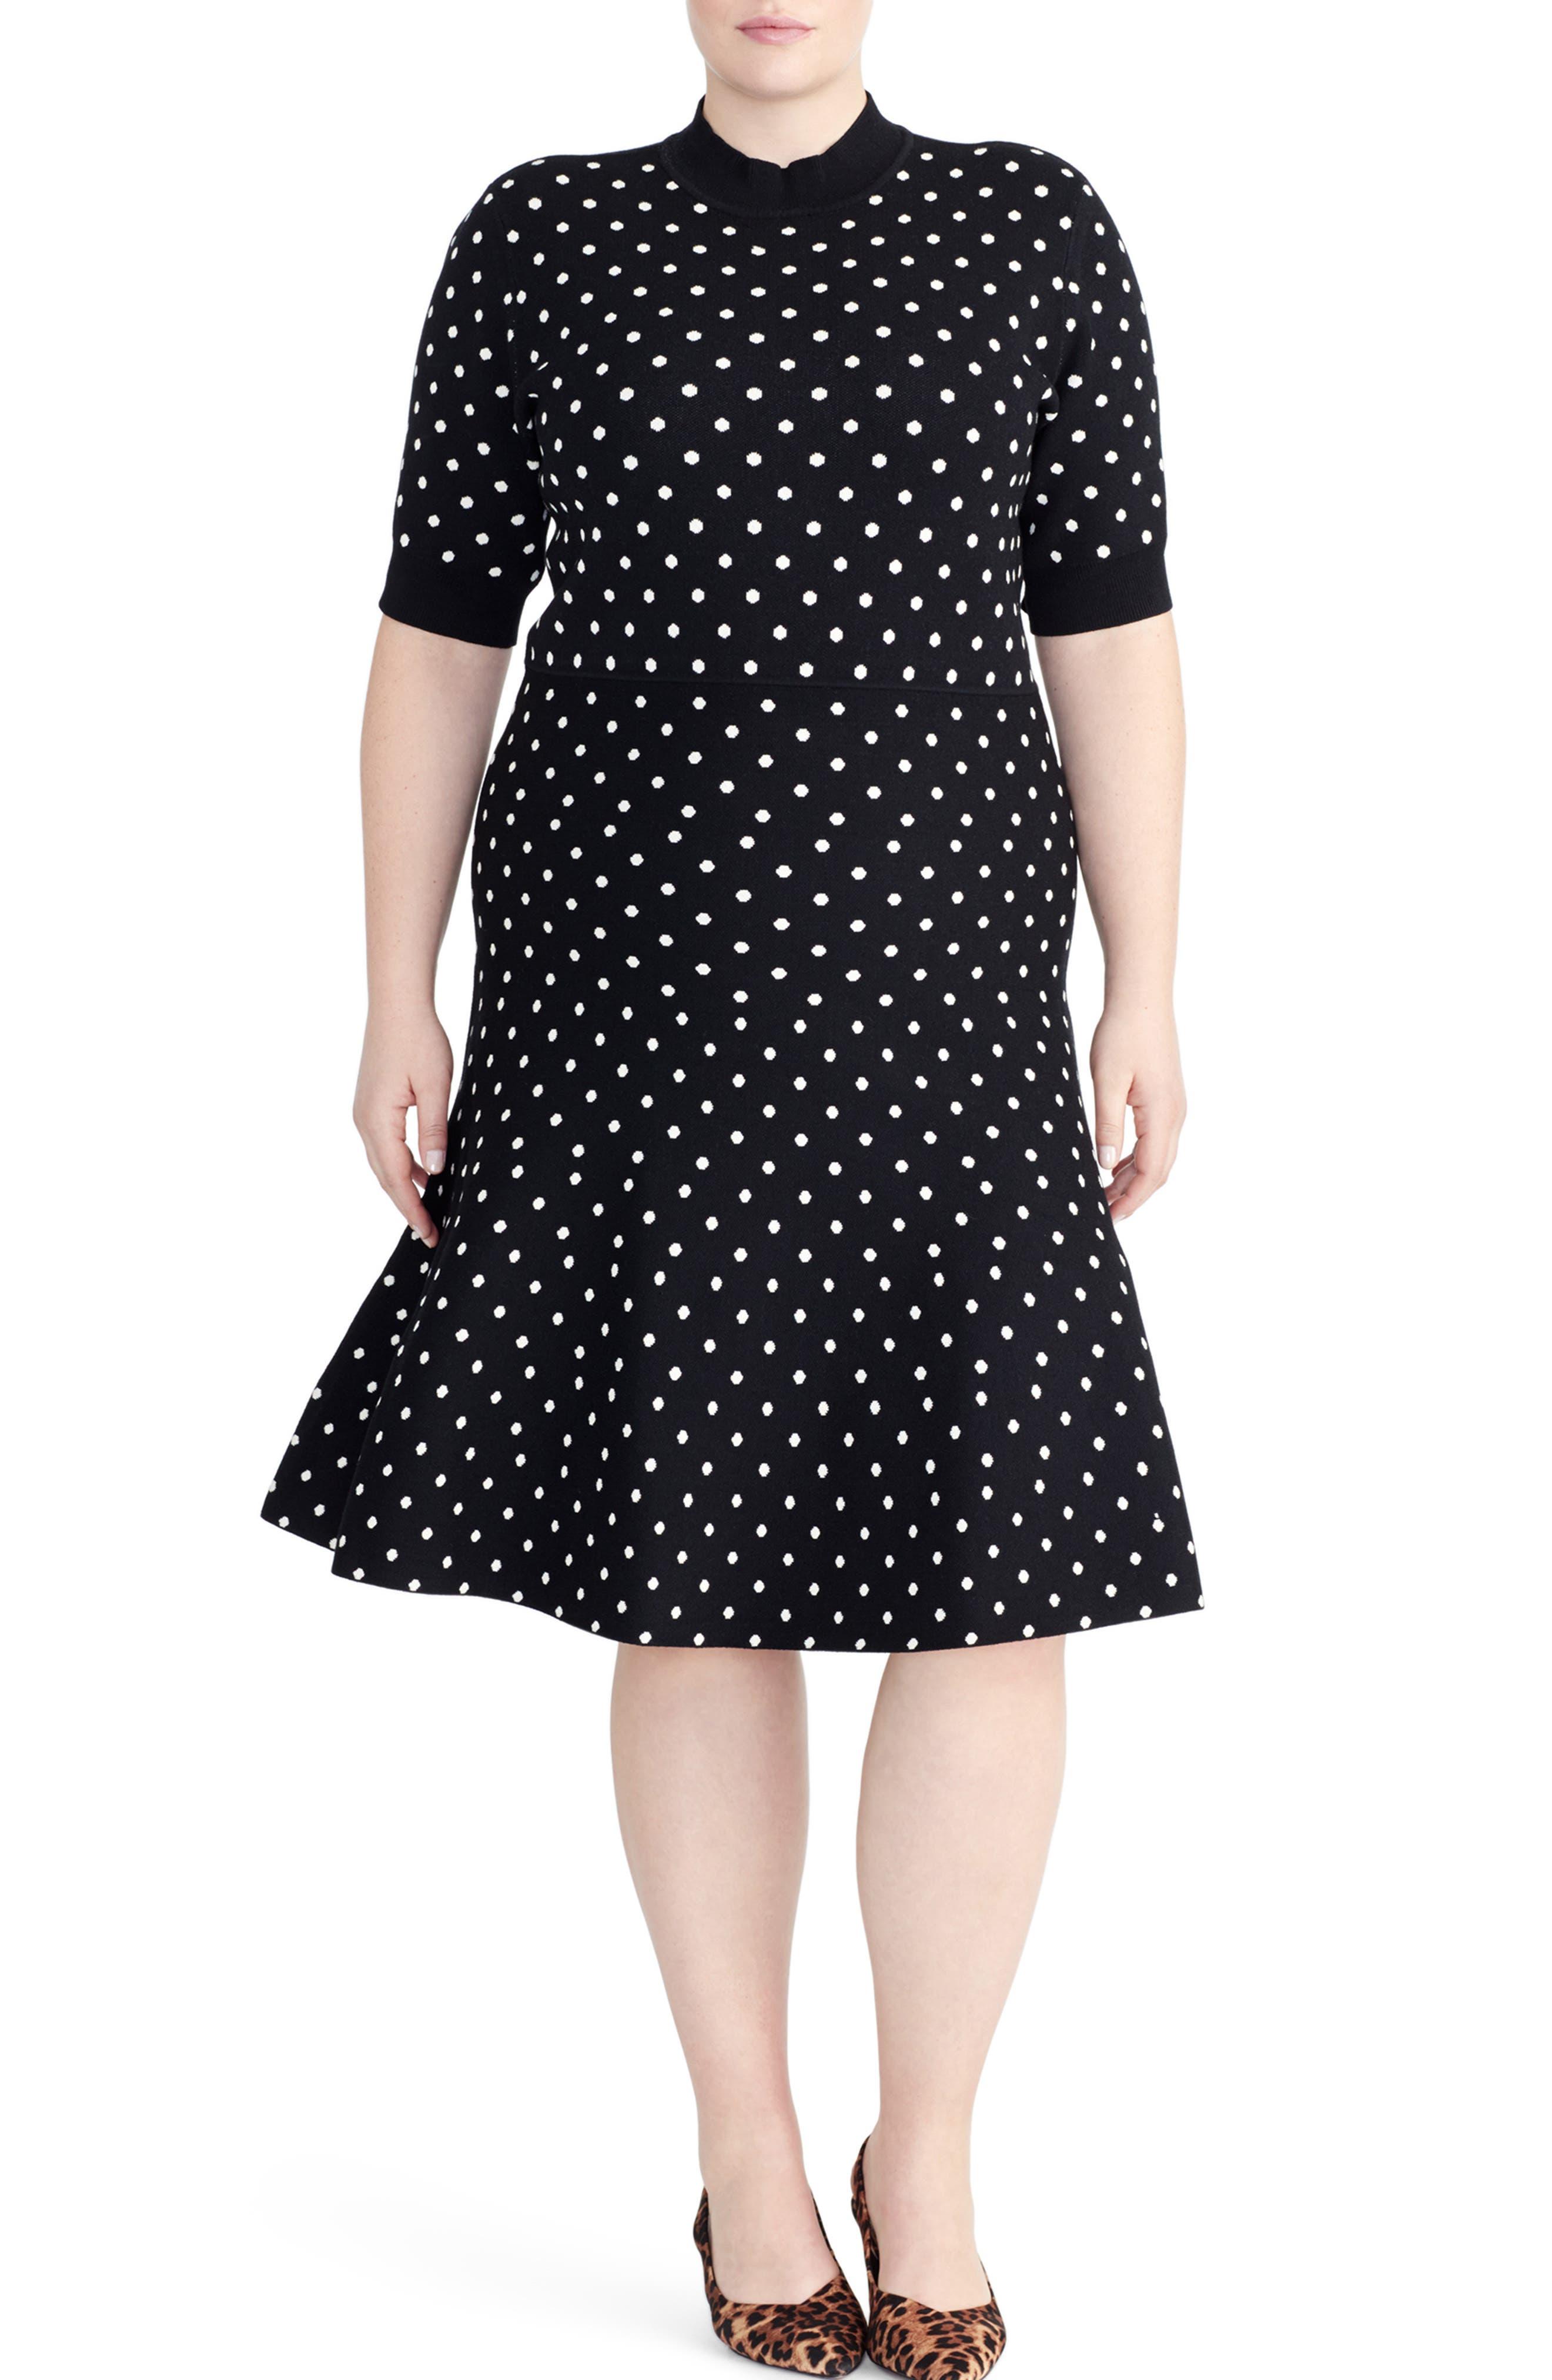 RACHEL ROY COLLECTION Polka Dot Fit & Flare Dress, Main, color, BLACK/ LIGHT BIEGE